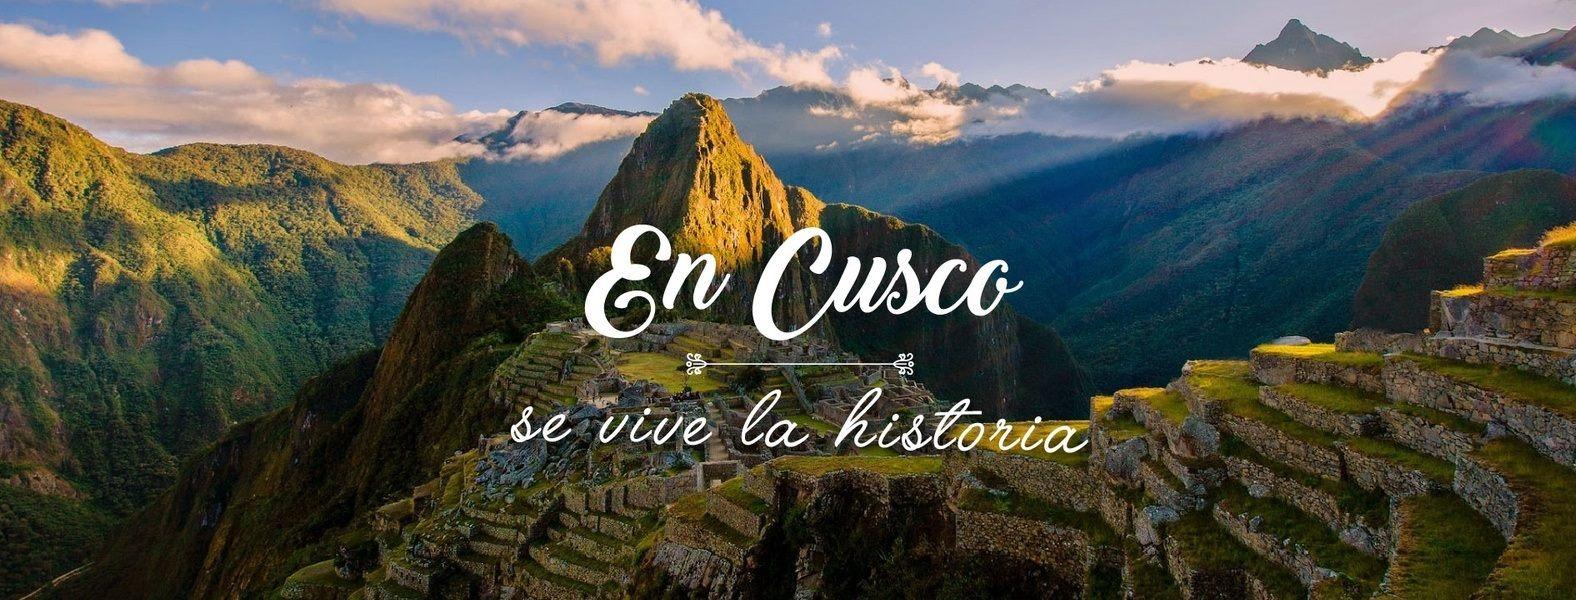 Portada Sonesta Cusco